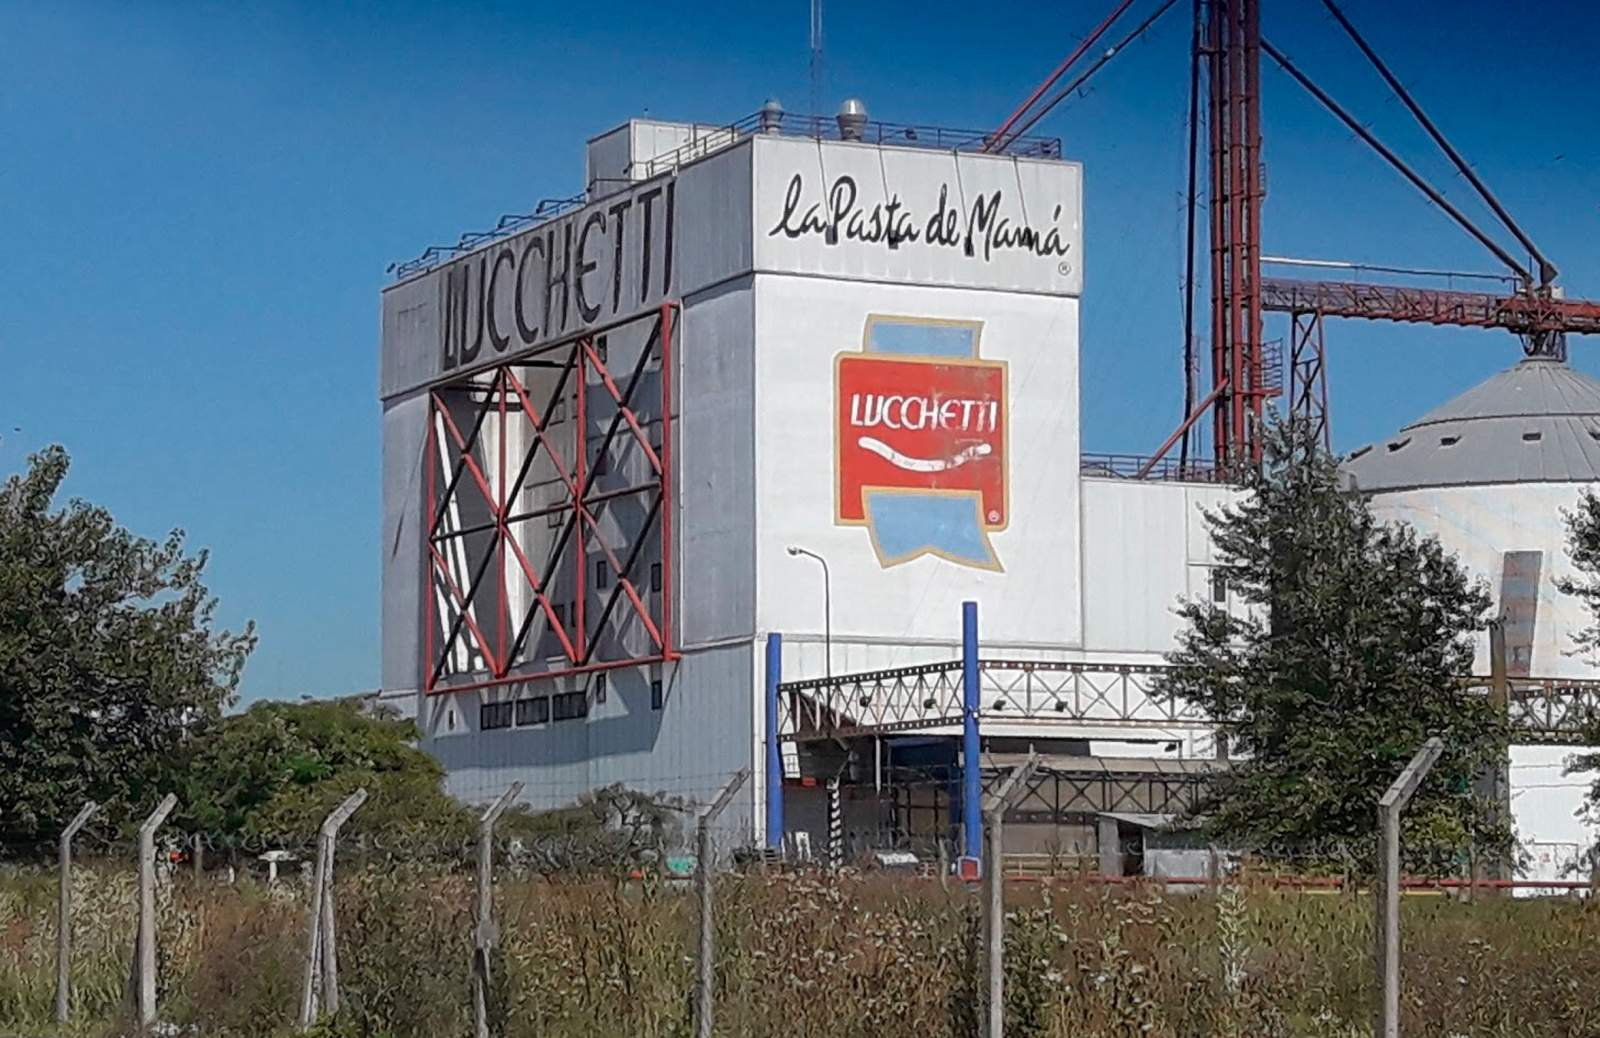 molinos-rio-de-la-plata-luchetti-1-proyecto-saxum-mineria-industria-construccion-empresas-ingenieria-argentina-litio-cementera